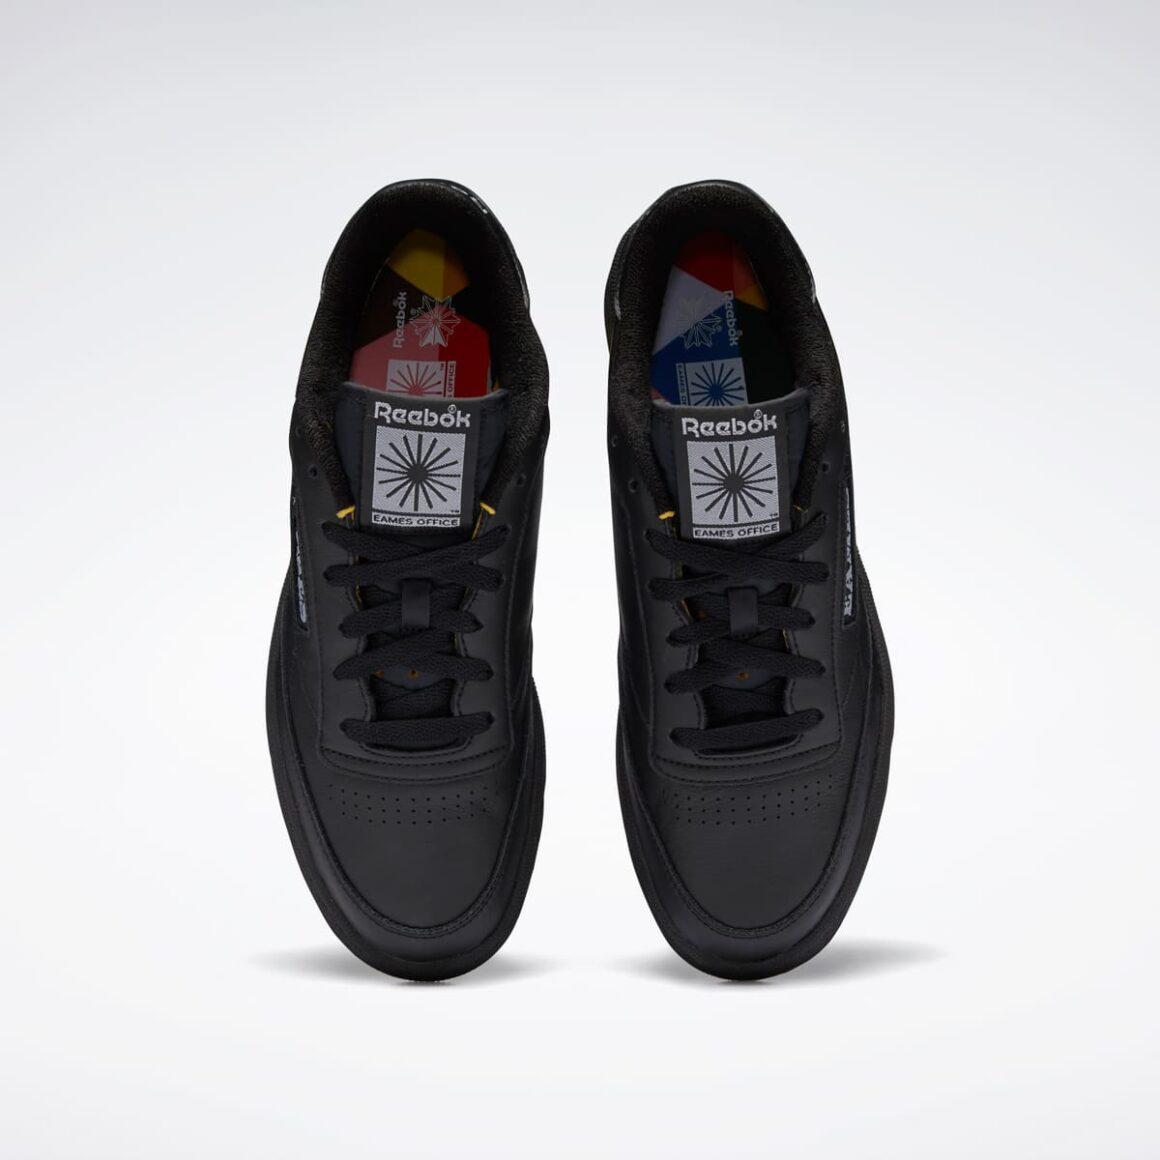 Reebok x Eames Club C Montone Pack GY1067 Top